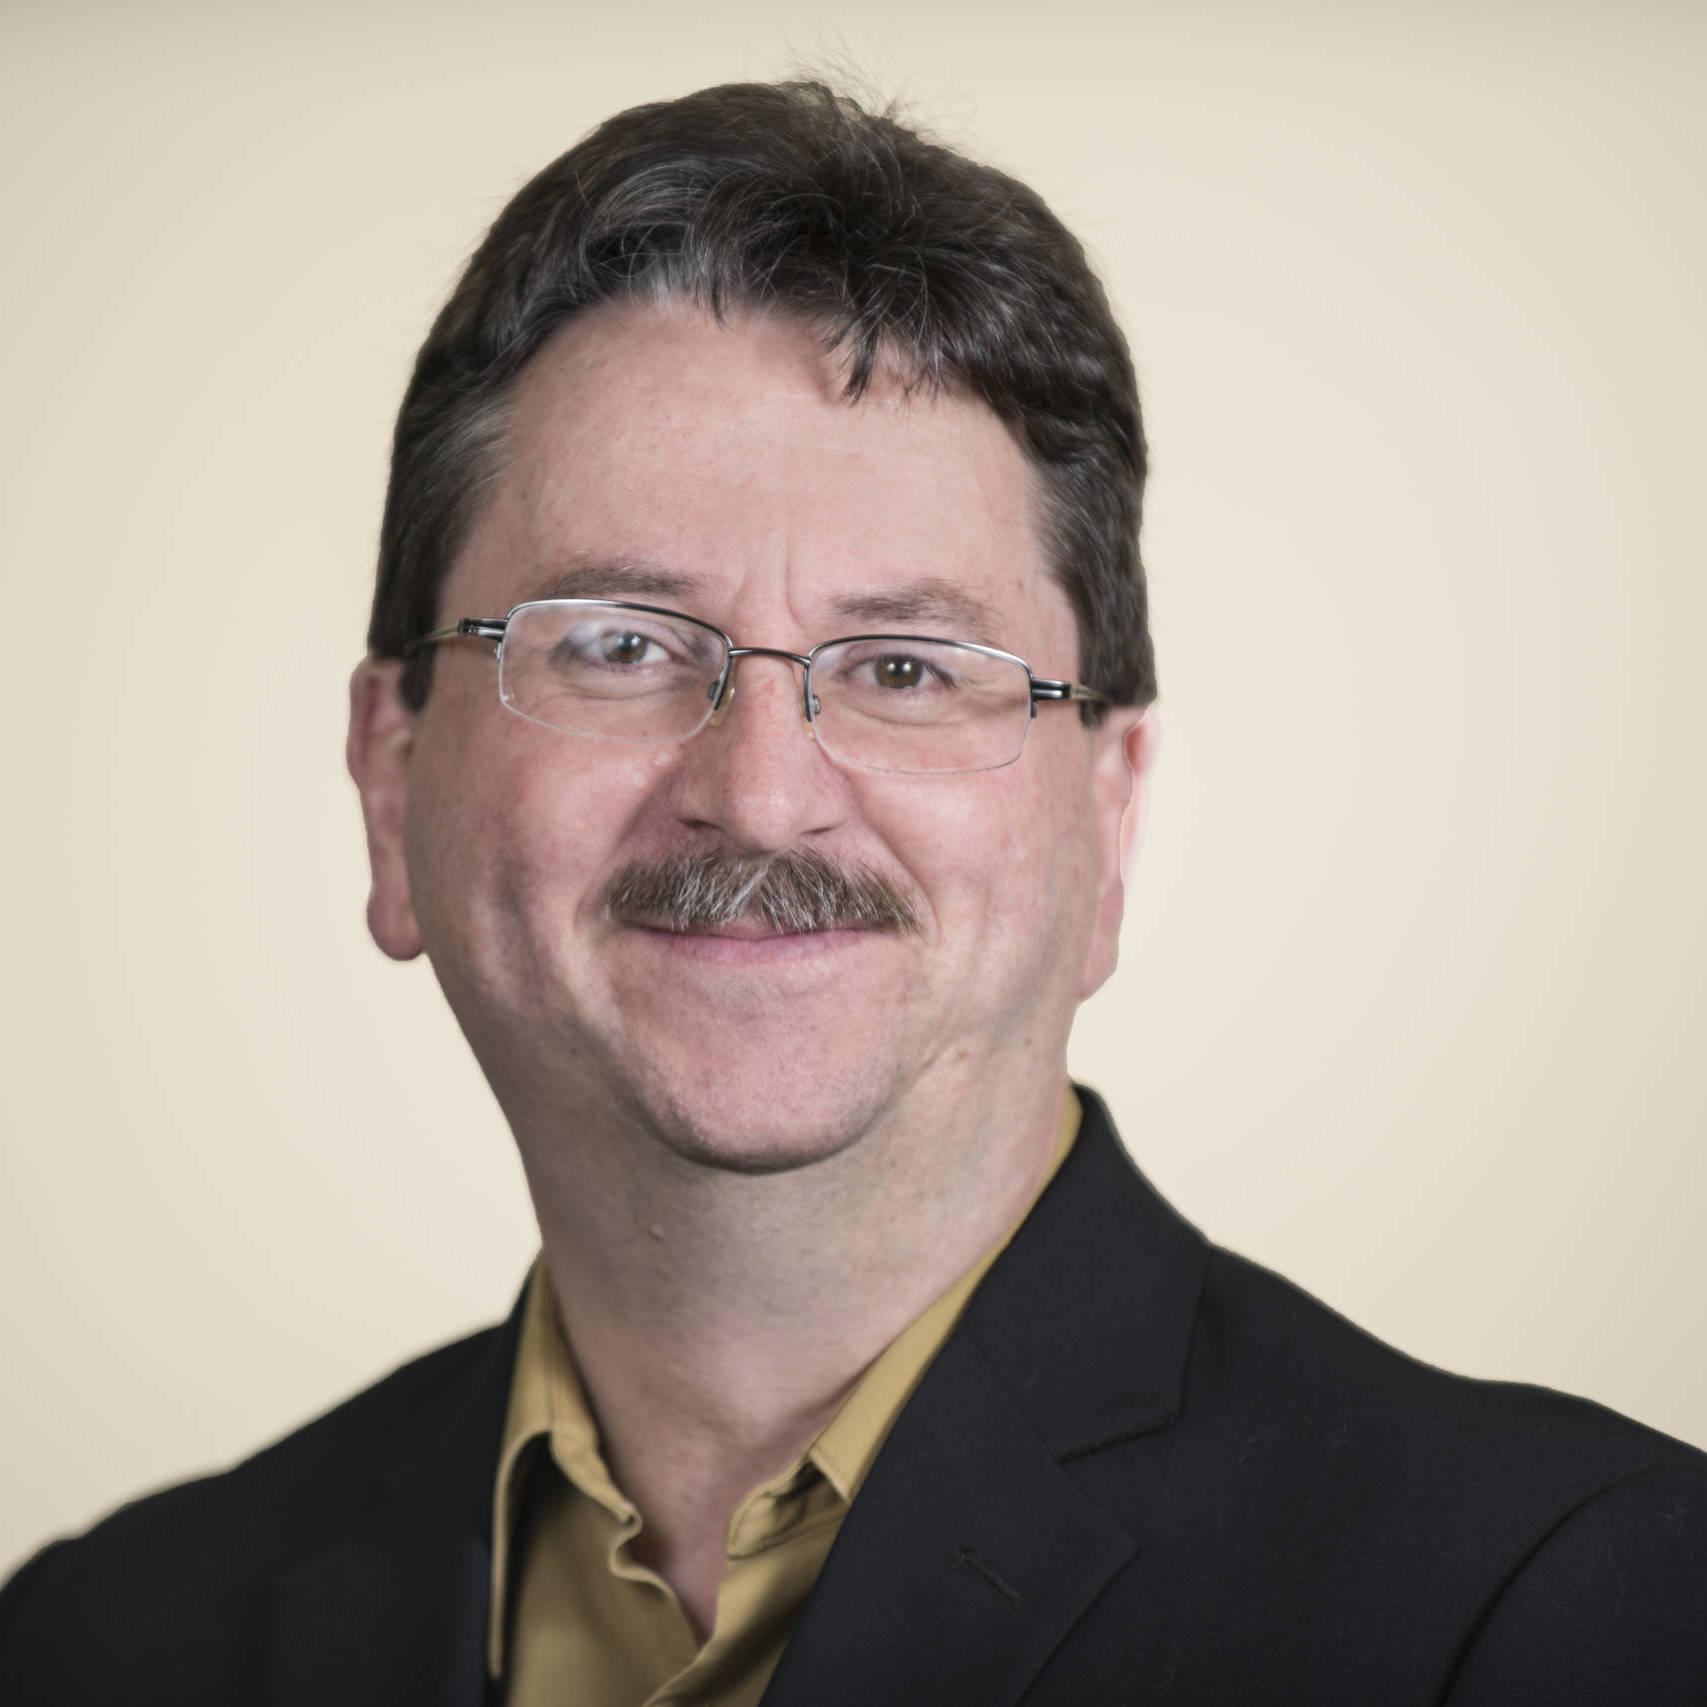 Kevin McCormick